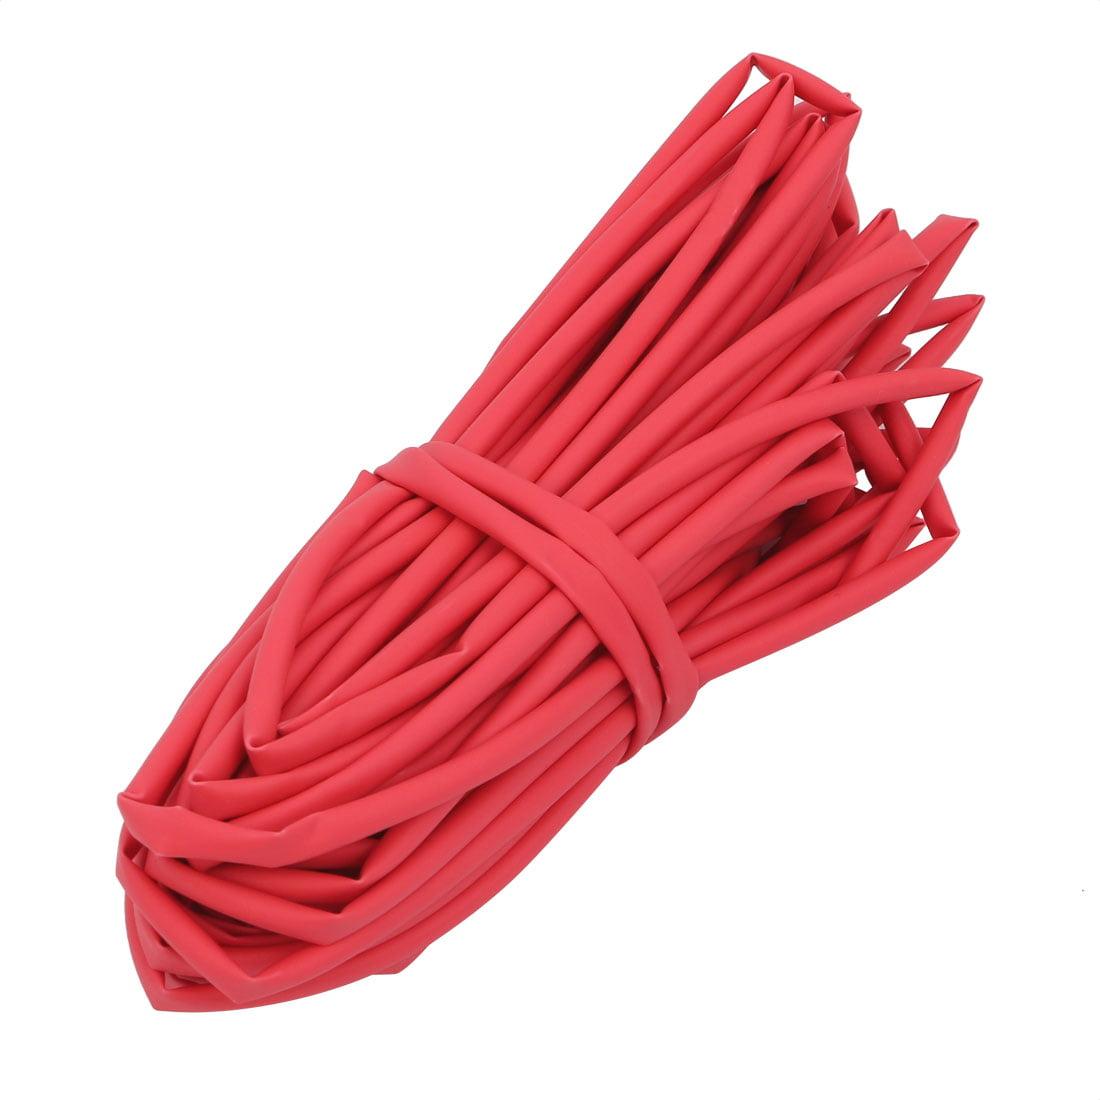 10M 2.5mm Inner Dia Polyolefin Flame Retardant Tube f Wire Repairing - image 2 of 2